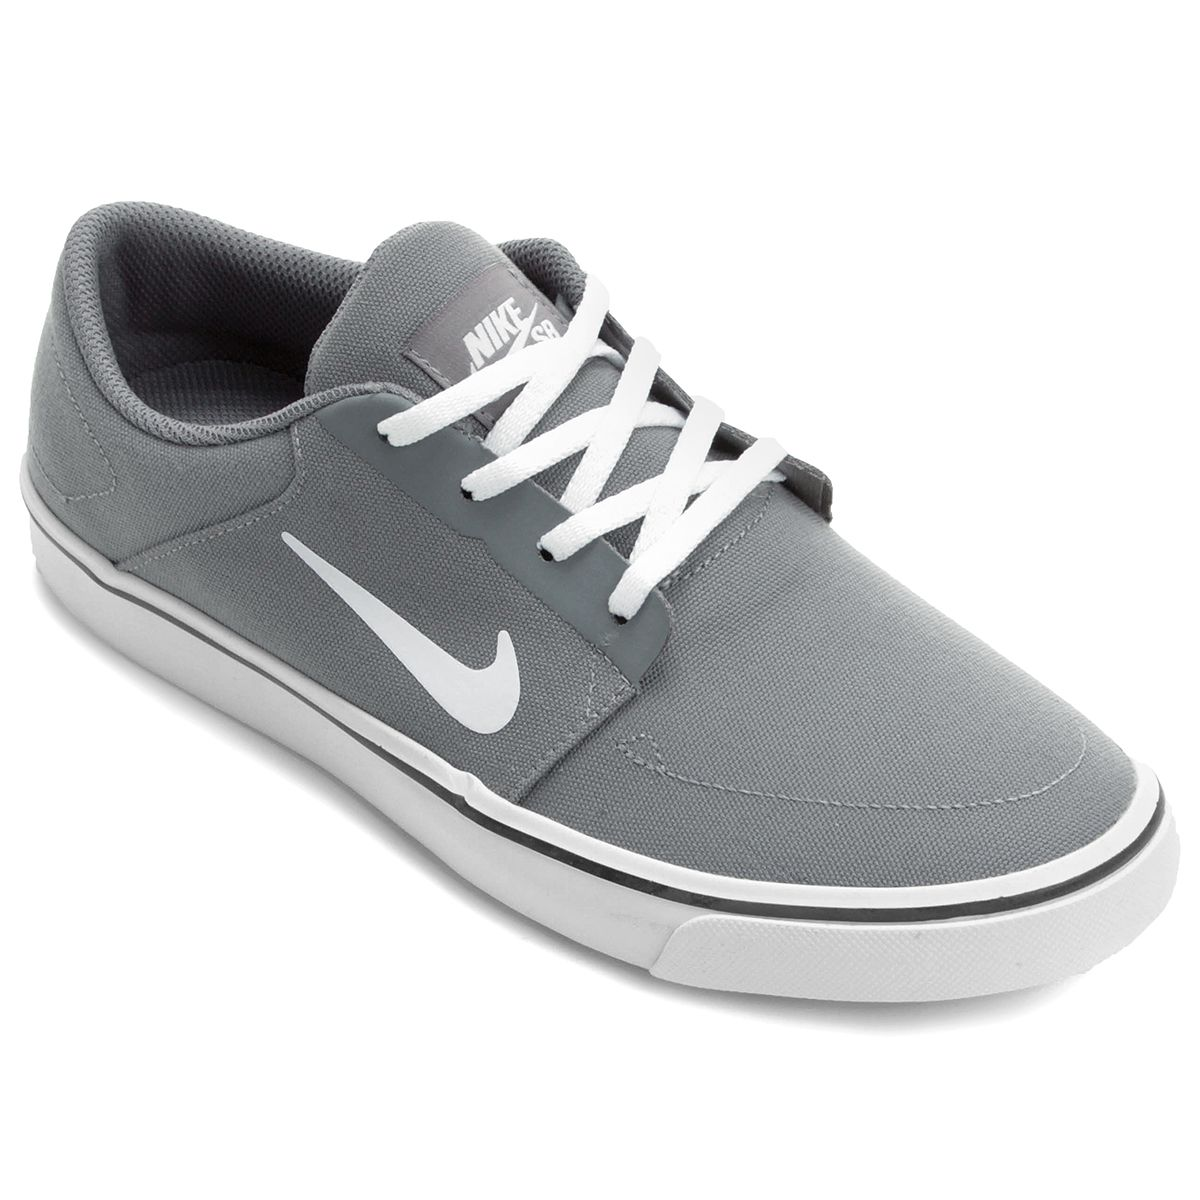 Tênis Nike Sb Portmore Cnvs Masculino Branco e Cinza